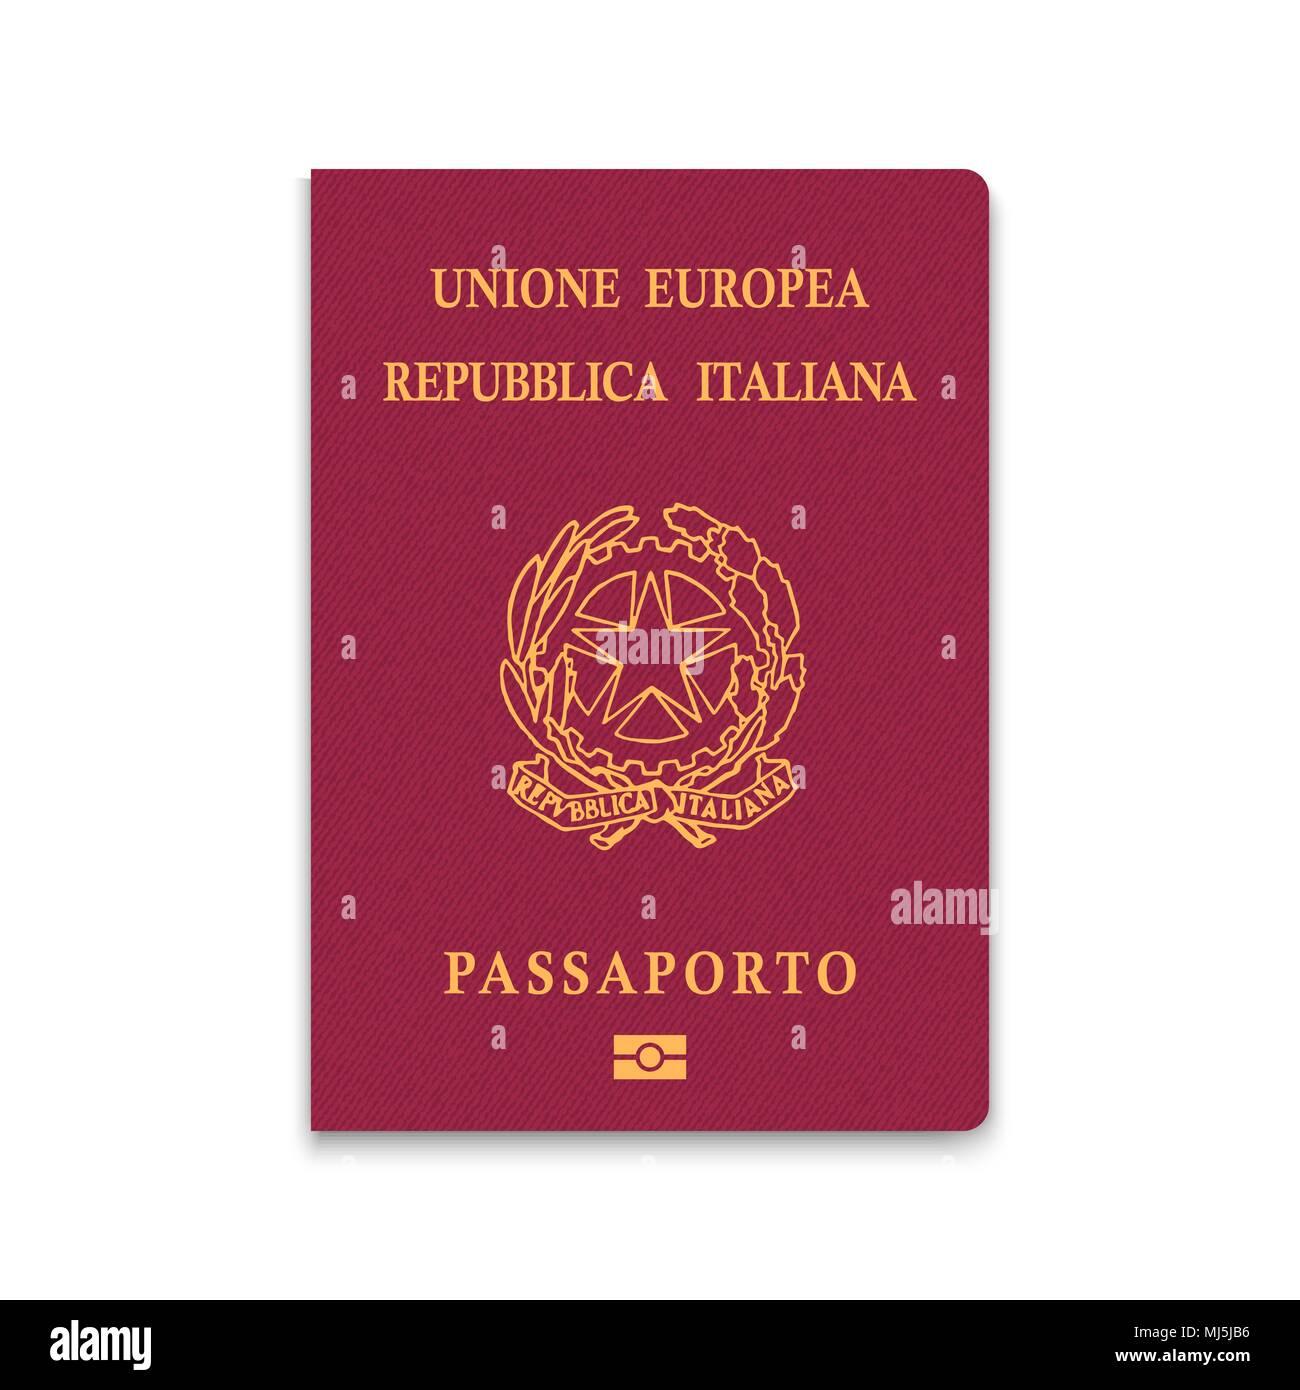 Passport of Italy. Vector illustration - Stock Image